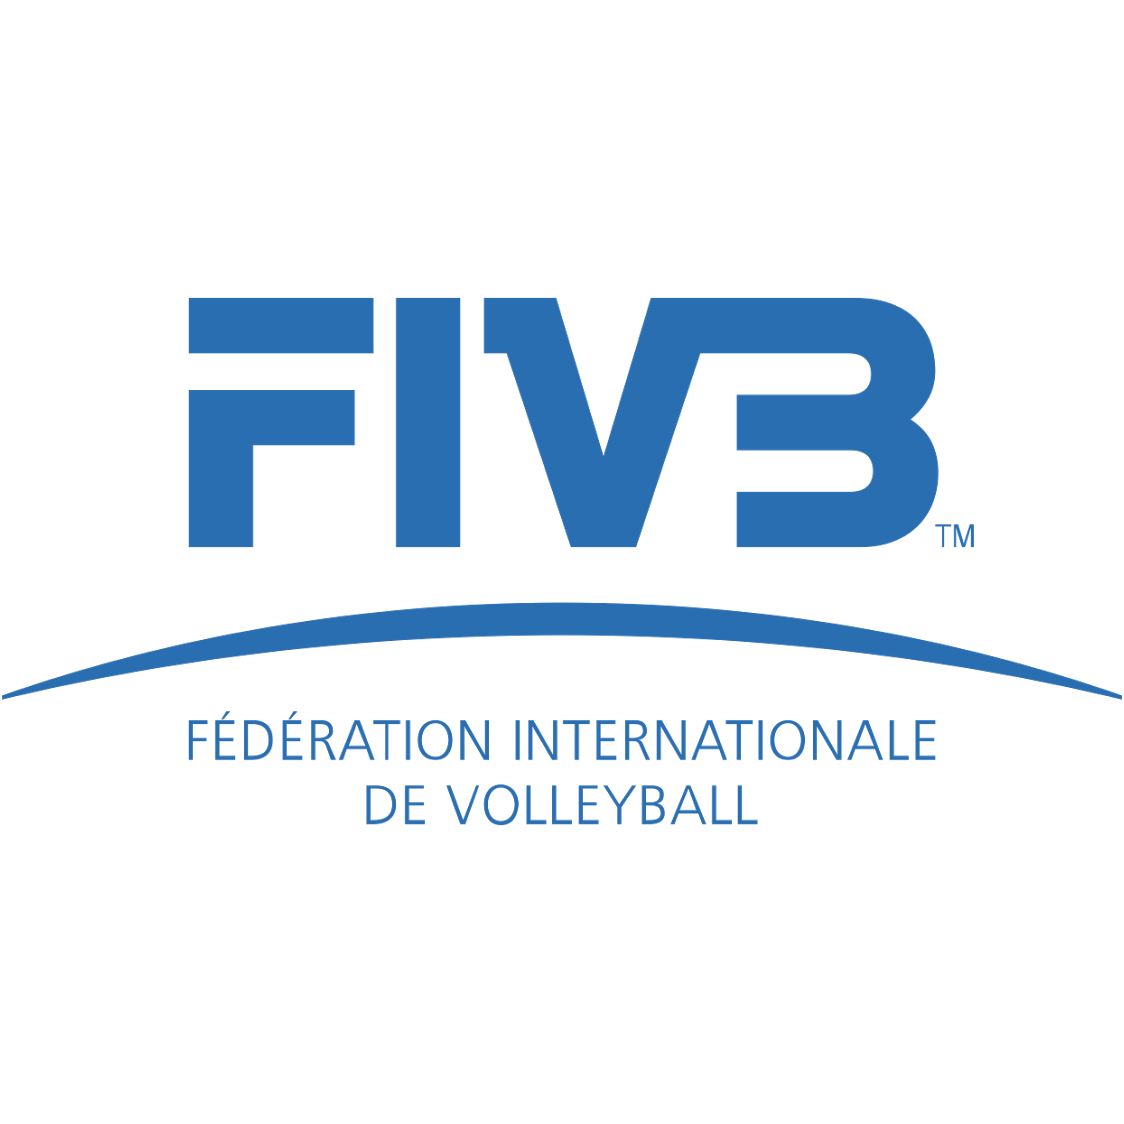 2014 FIVB Volleyball Women's Club World Championship